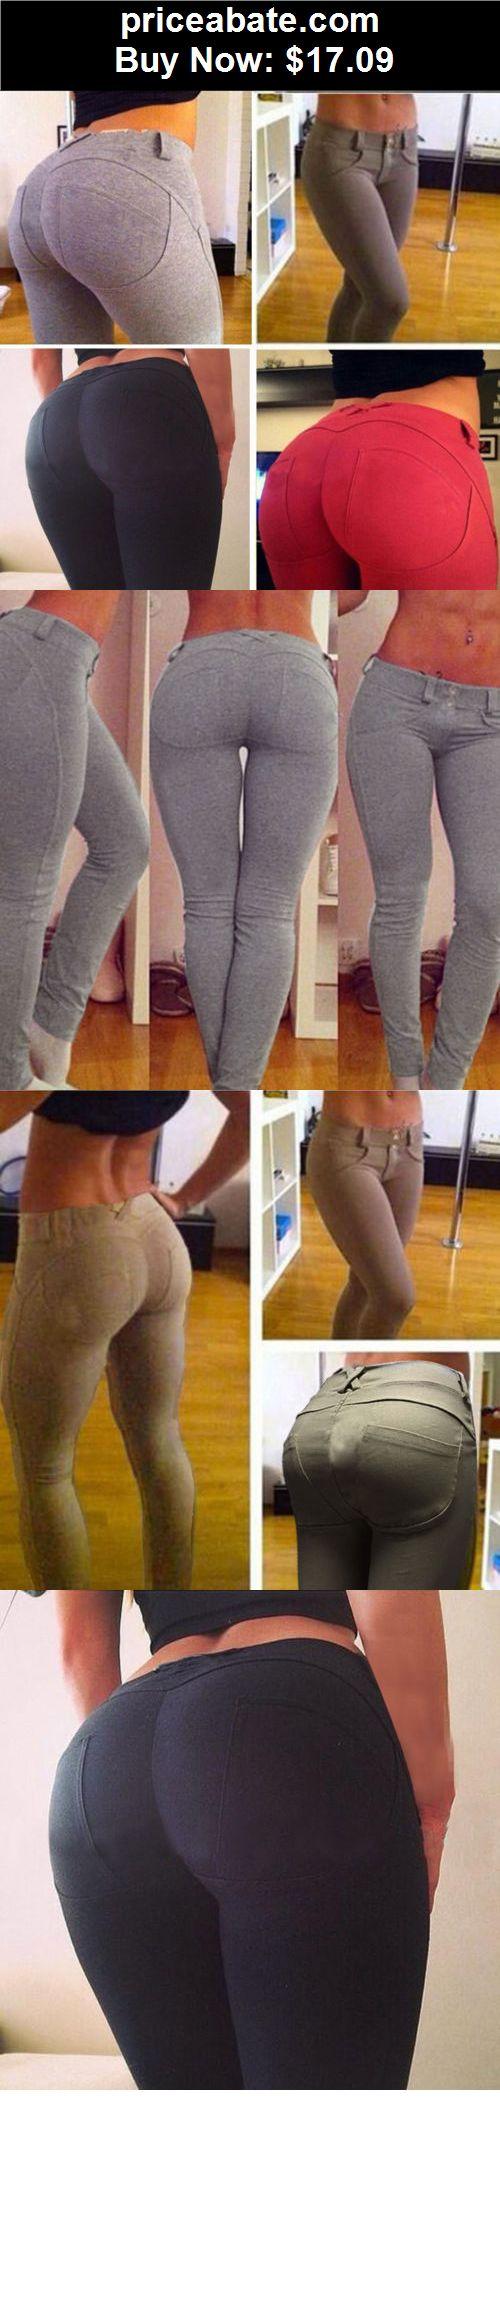 Women-Leggings: Hot Sexy Women Jeggings Stretch Cotton Jeans Leggings Butt Lift Skinny Leg Pants - BUY IT NOW ONLY $17.09